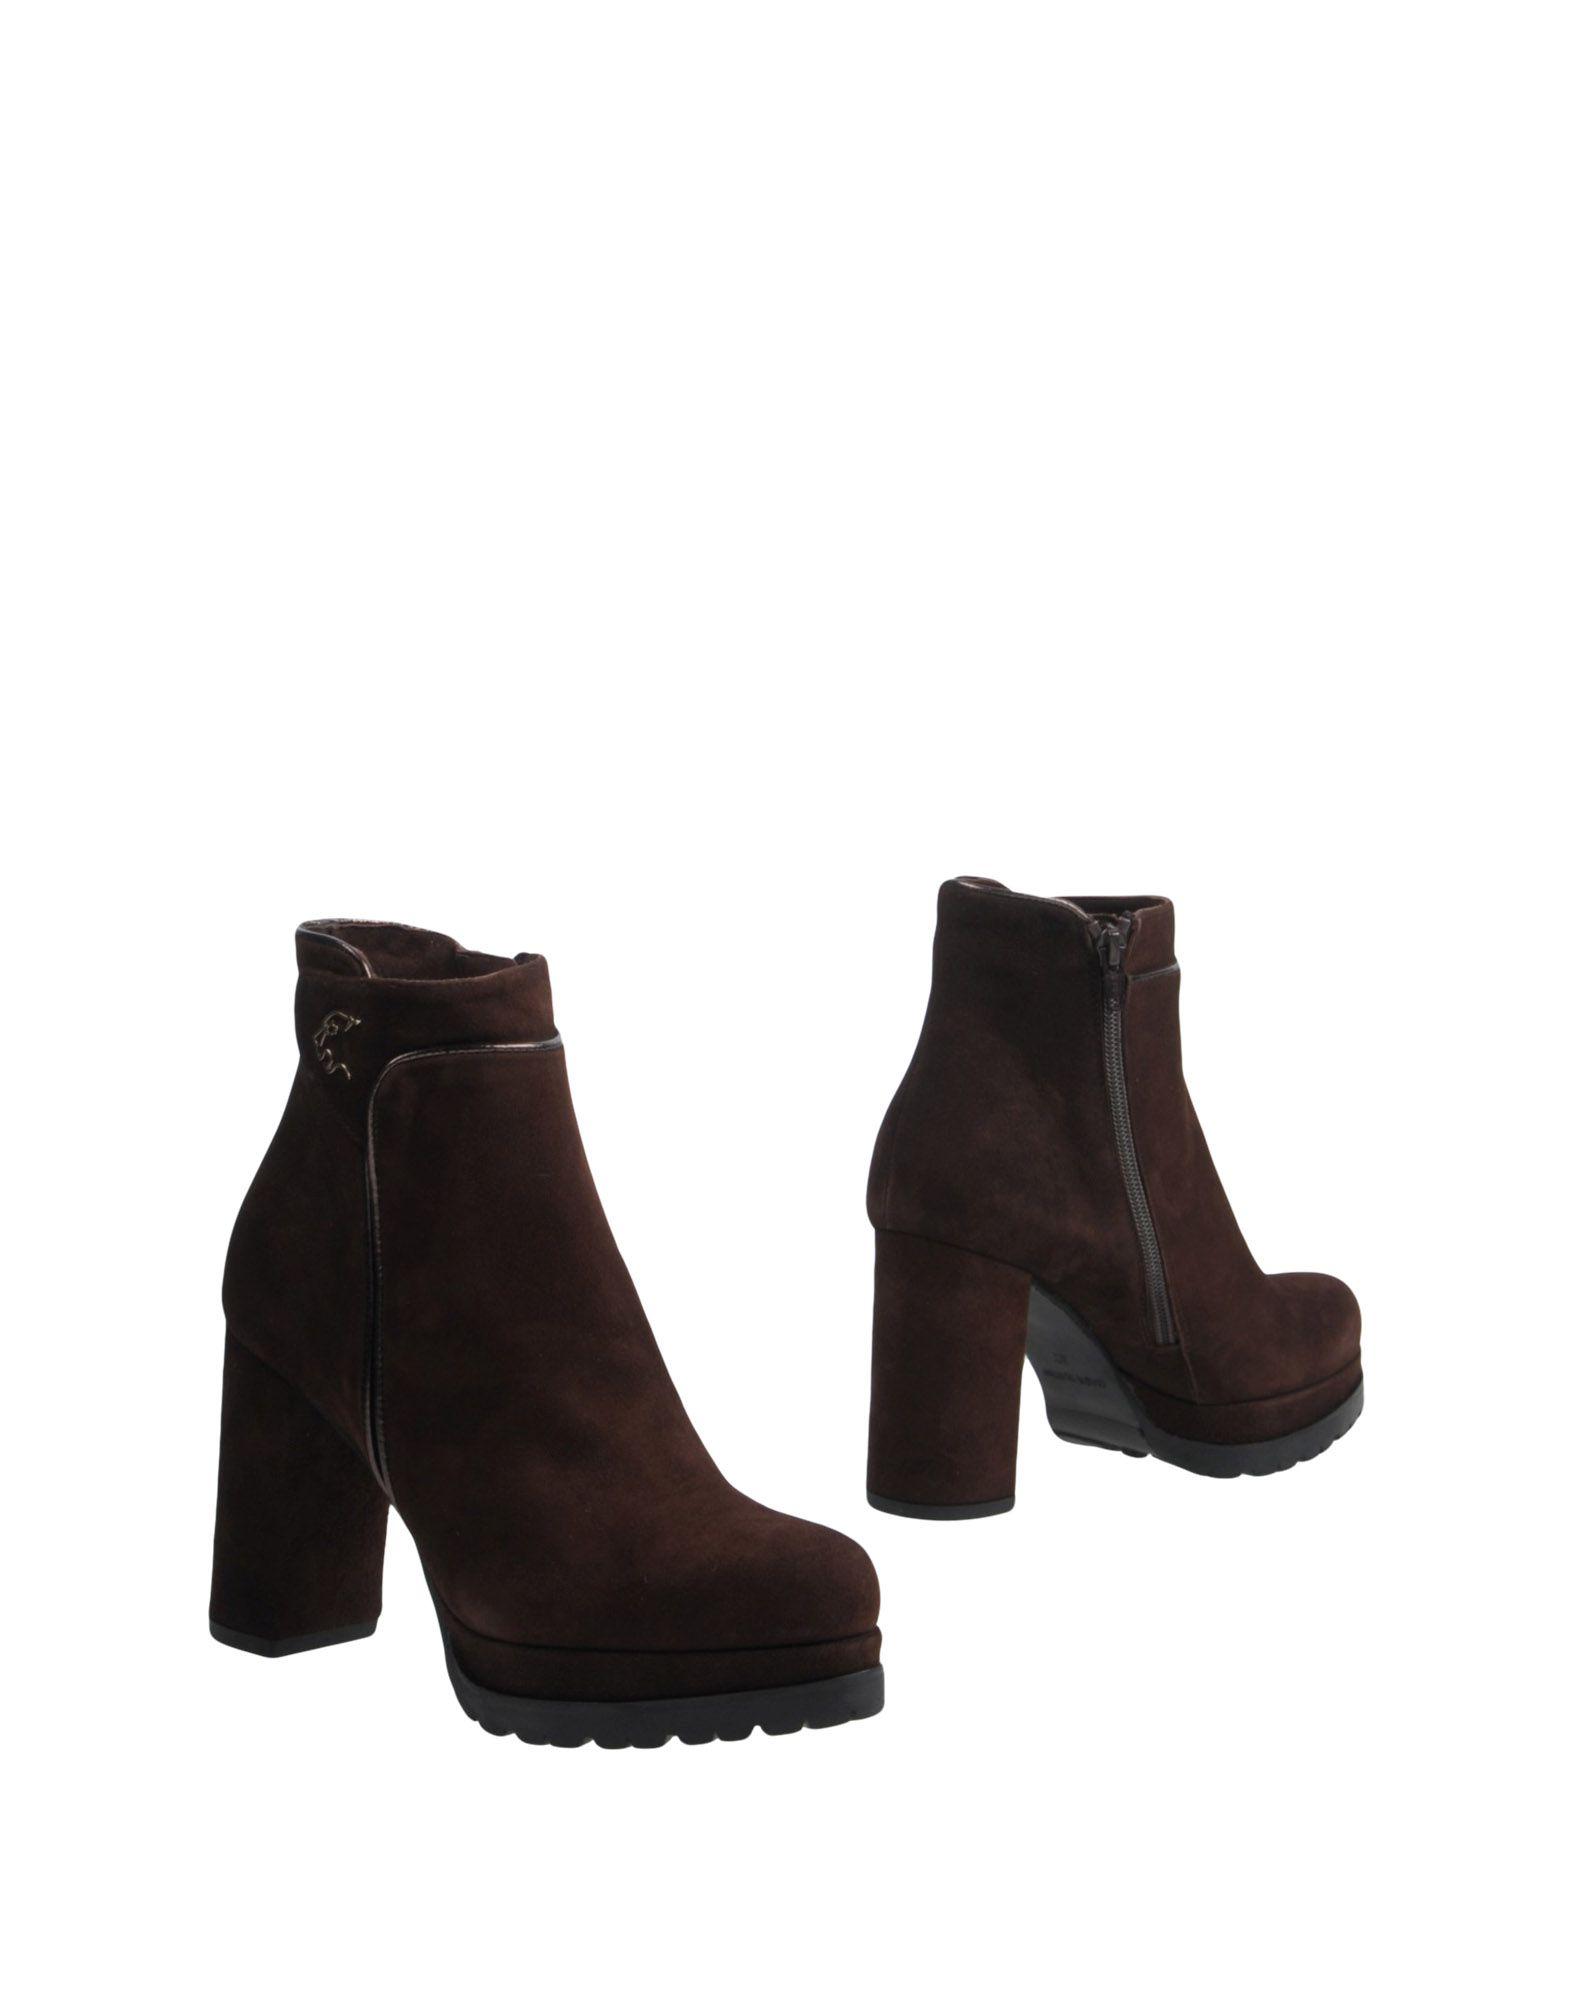 Norma J.Baker Ankle J.Baker Boot - Women Norma J.Baker Ankle Ankle Boots online on  United Kingdom - 11447236LV 704615